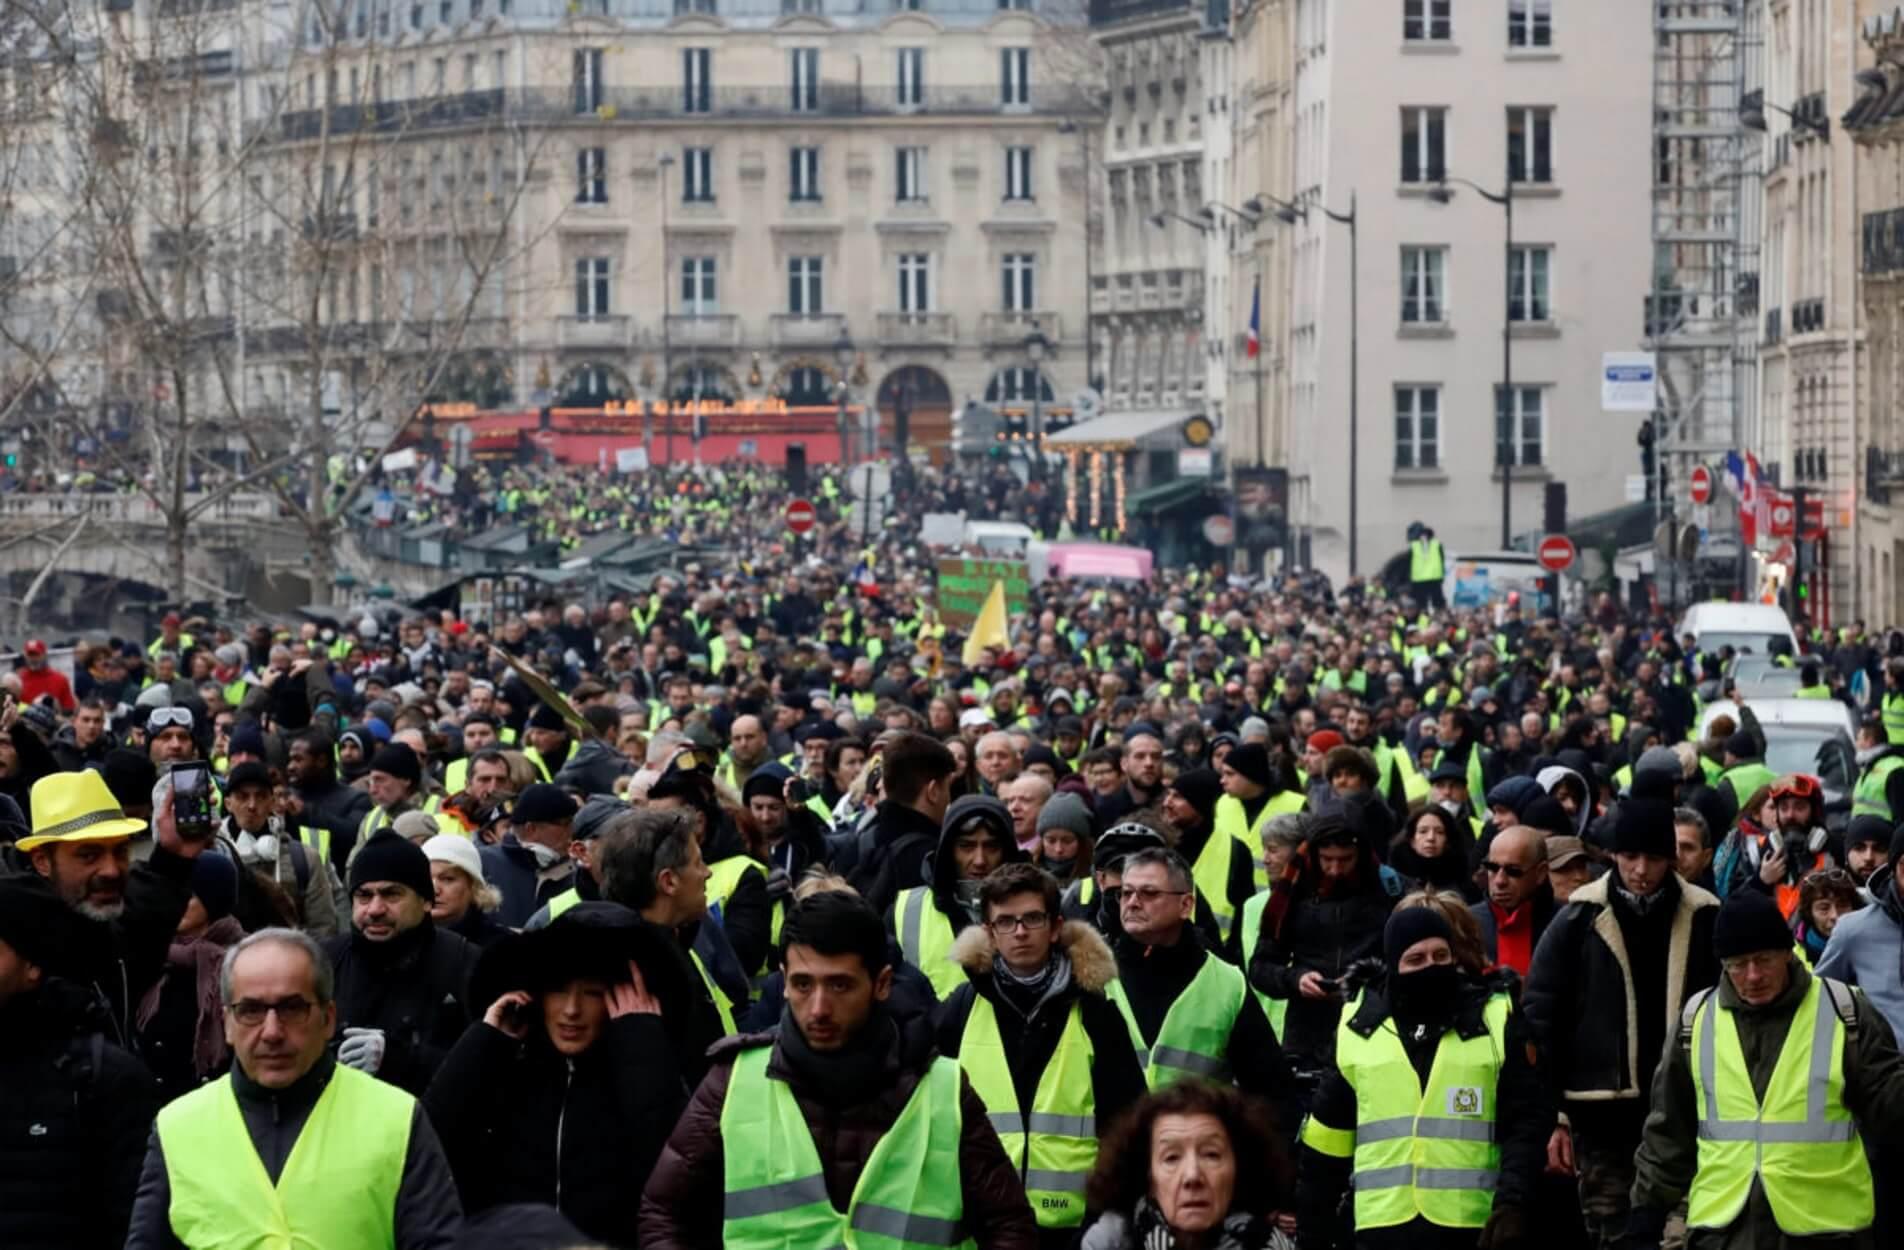 Tο κόμμα της Μαρίν Λε Πεν ψήφισαν τα κίτρινα γιλέκα στις ευρωεκλογές